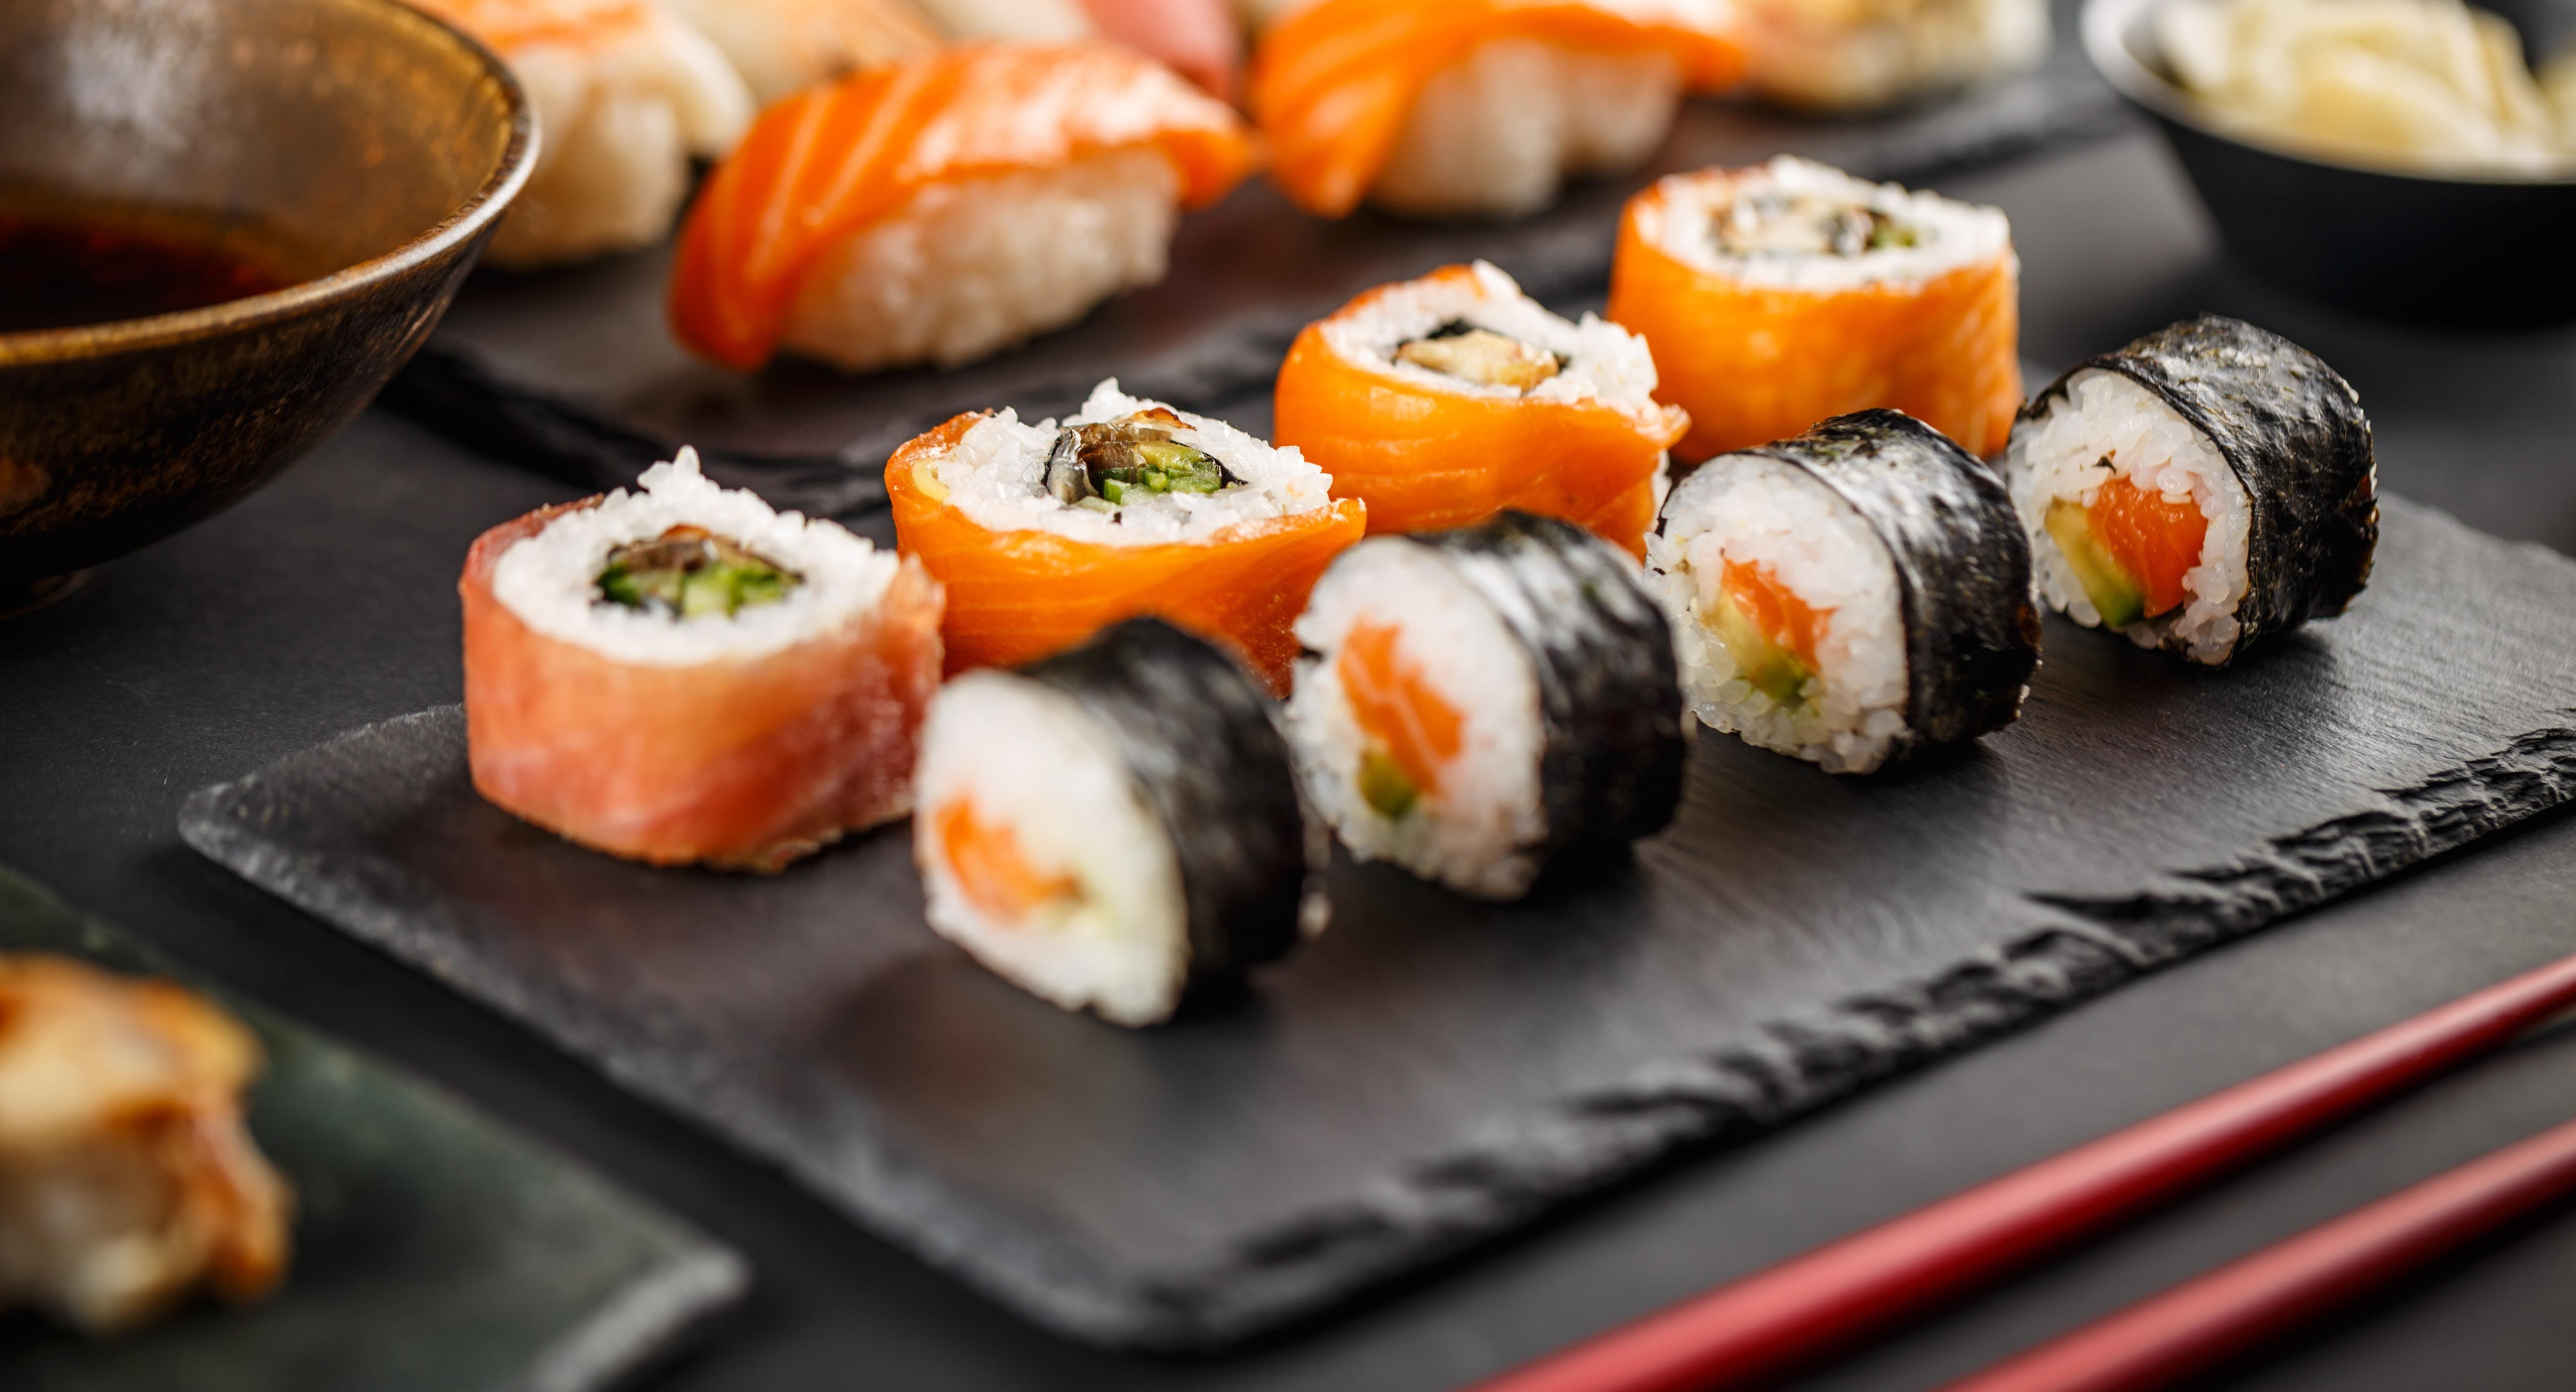 Amdo Sushi & Grill Bonn image 2